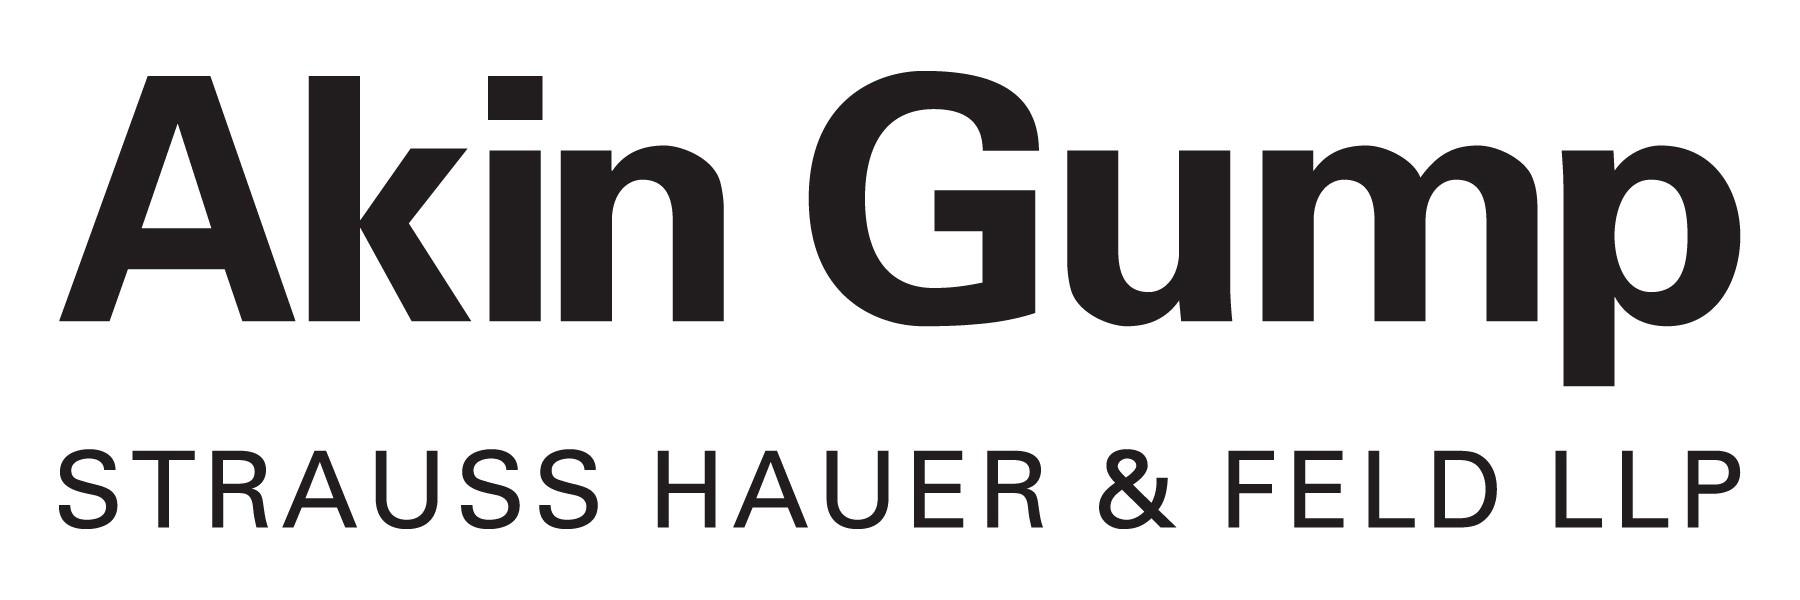 2017-AkinGump-FW_LogoSILVER